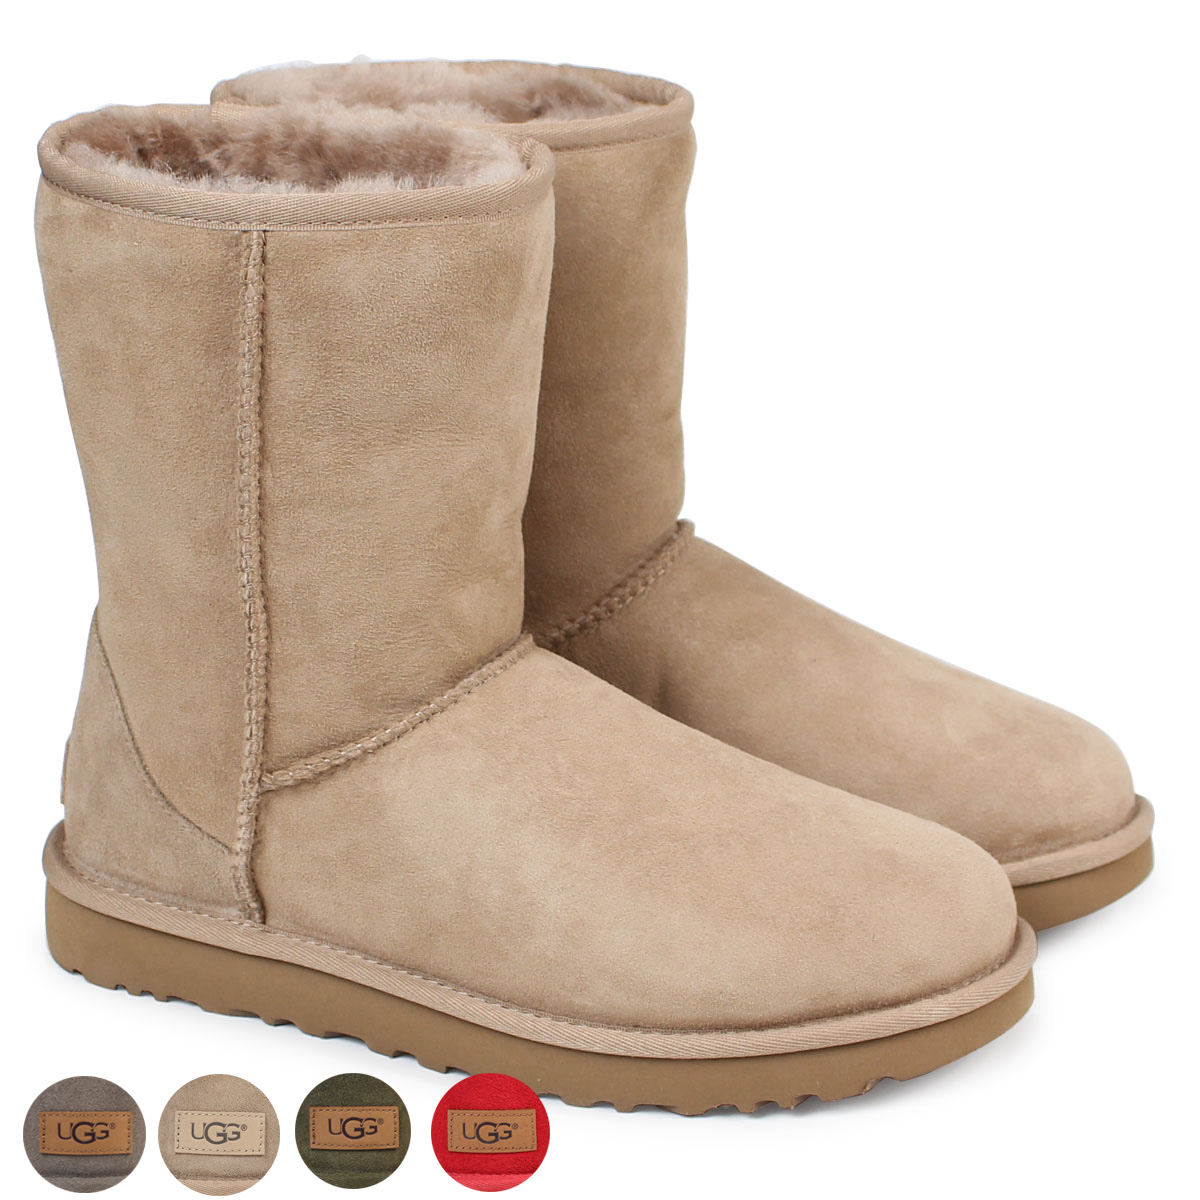 243d0c743c5 low cost ugg 5825 boots 9 west 78318 7c2cf